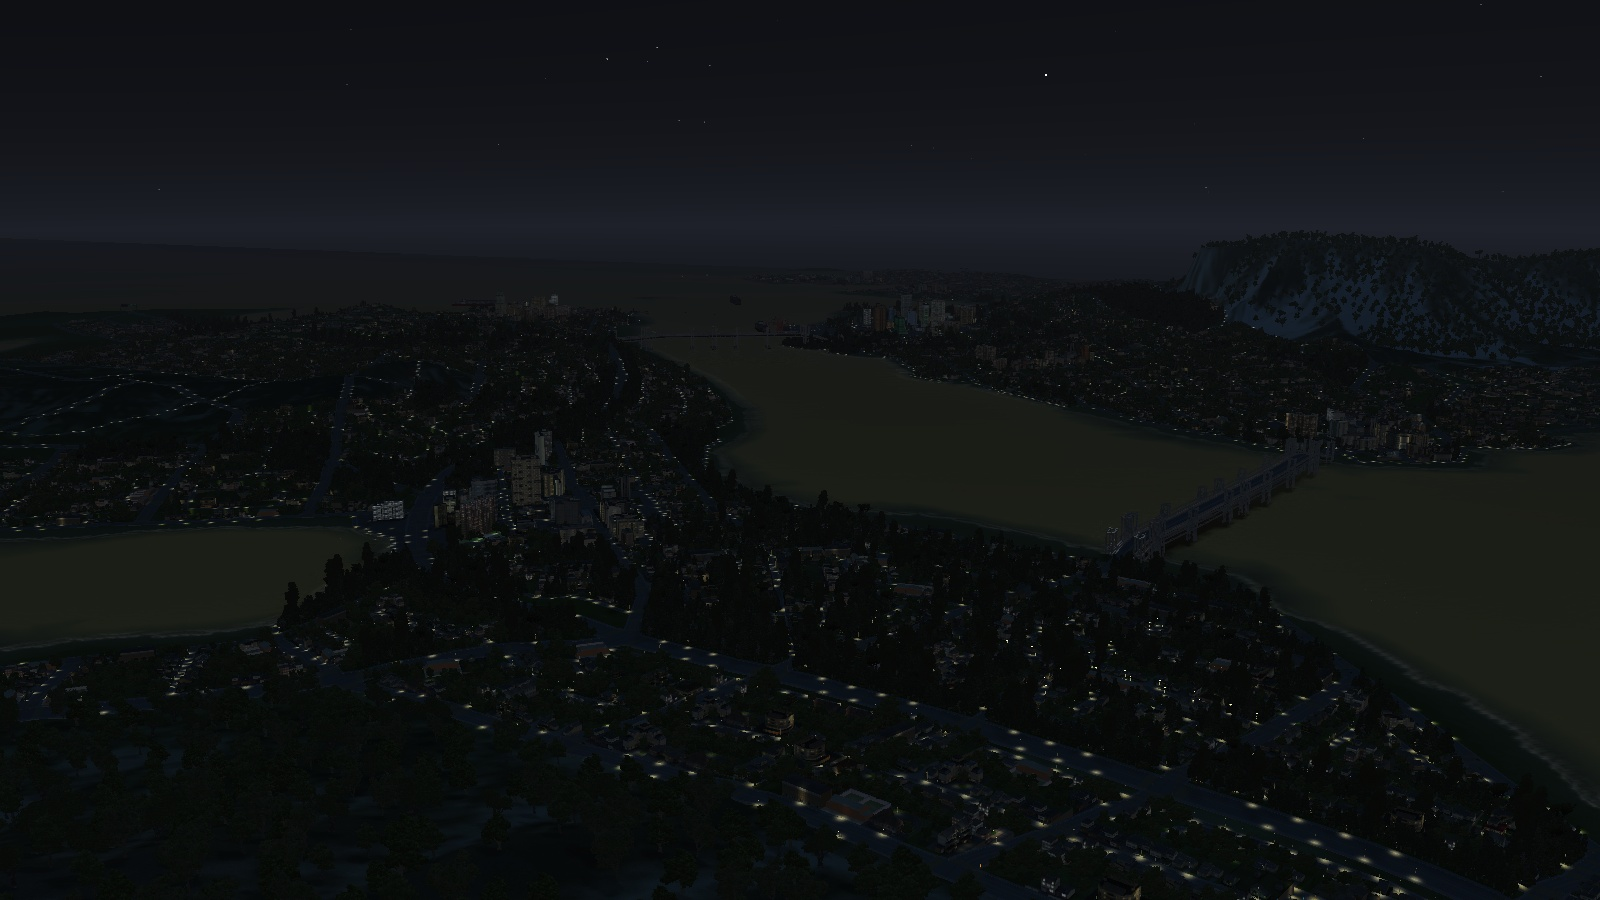 cxl_screenshot_bowie_15.jpg